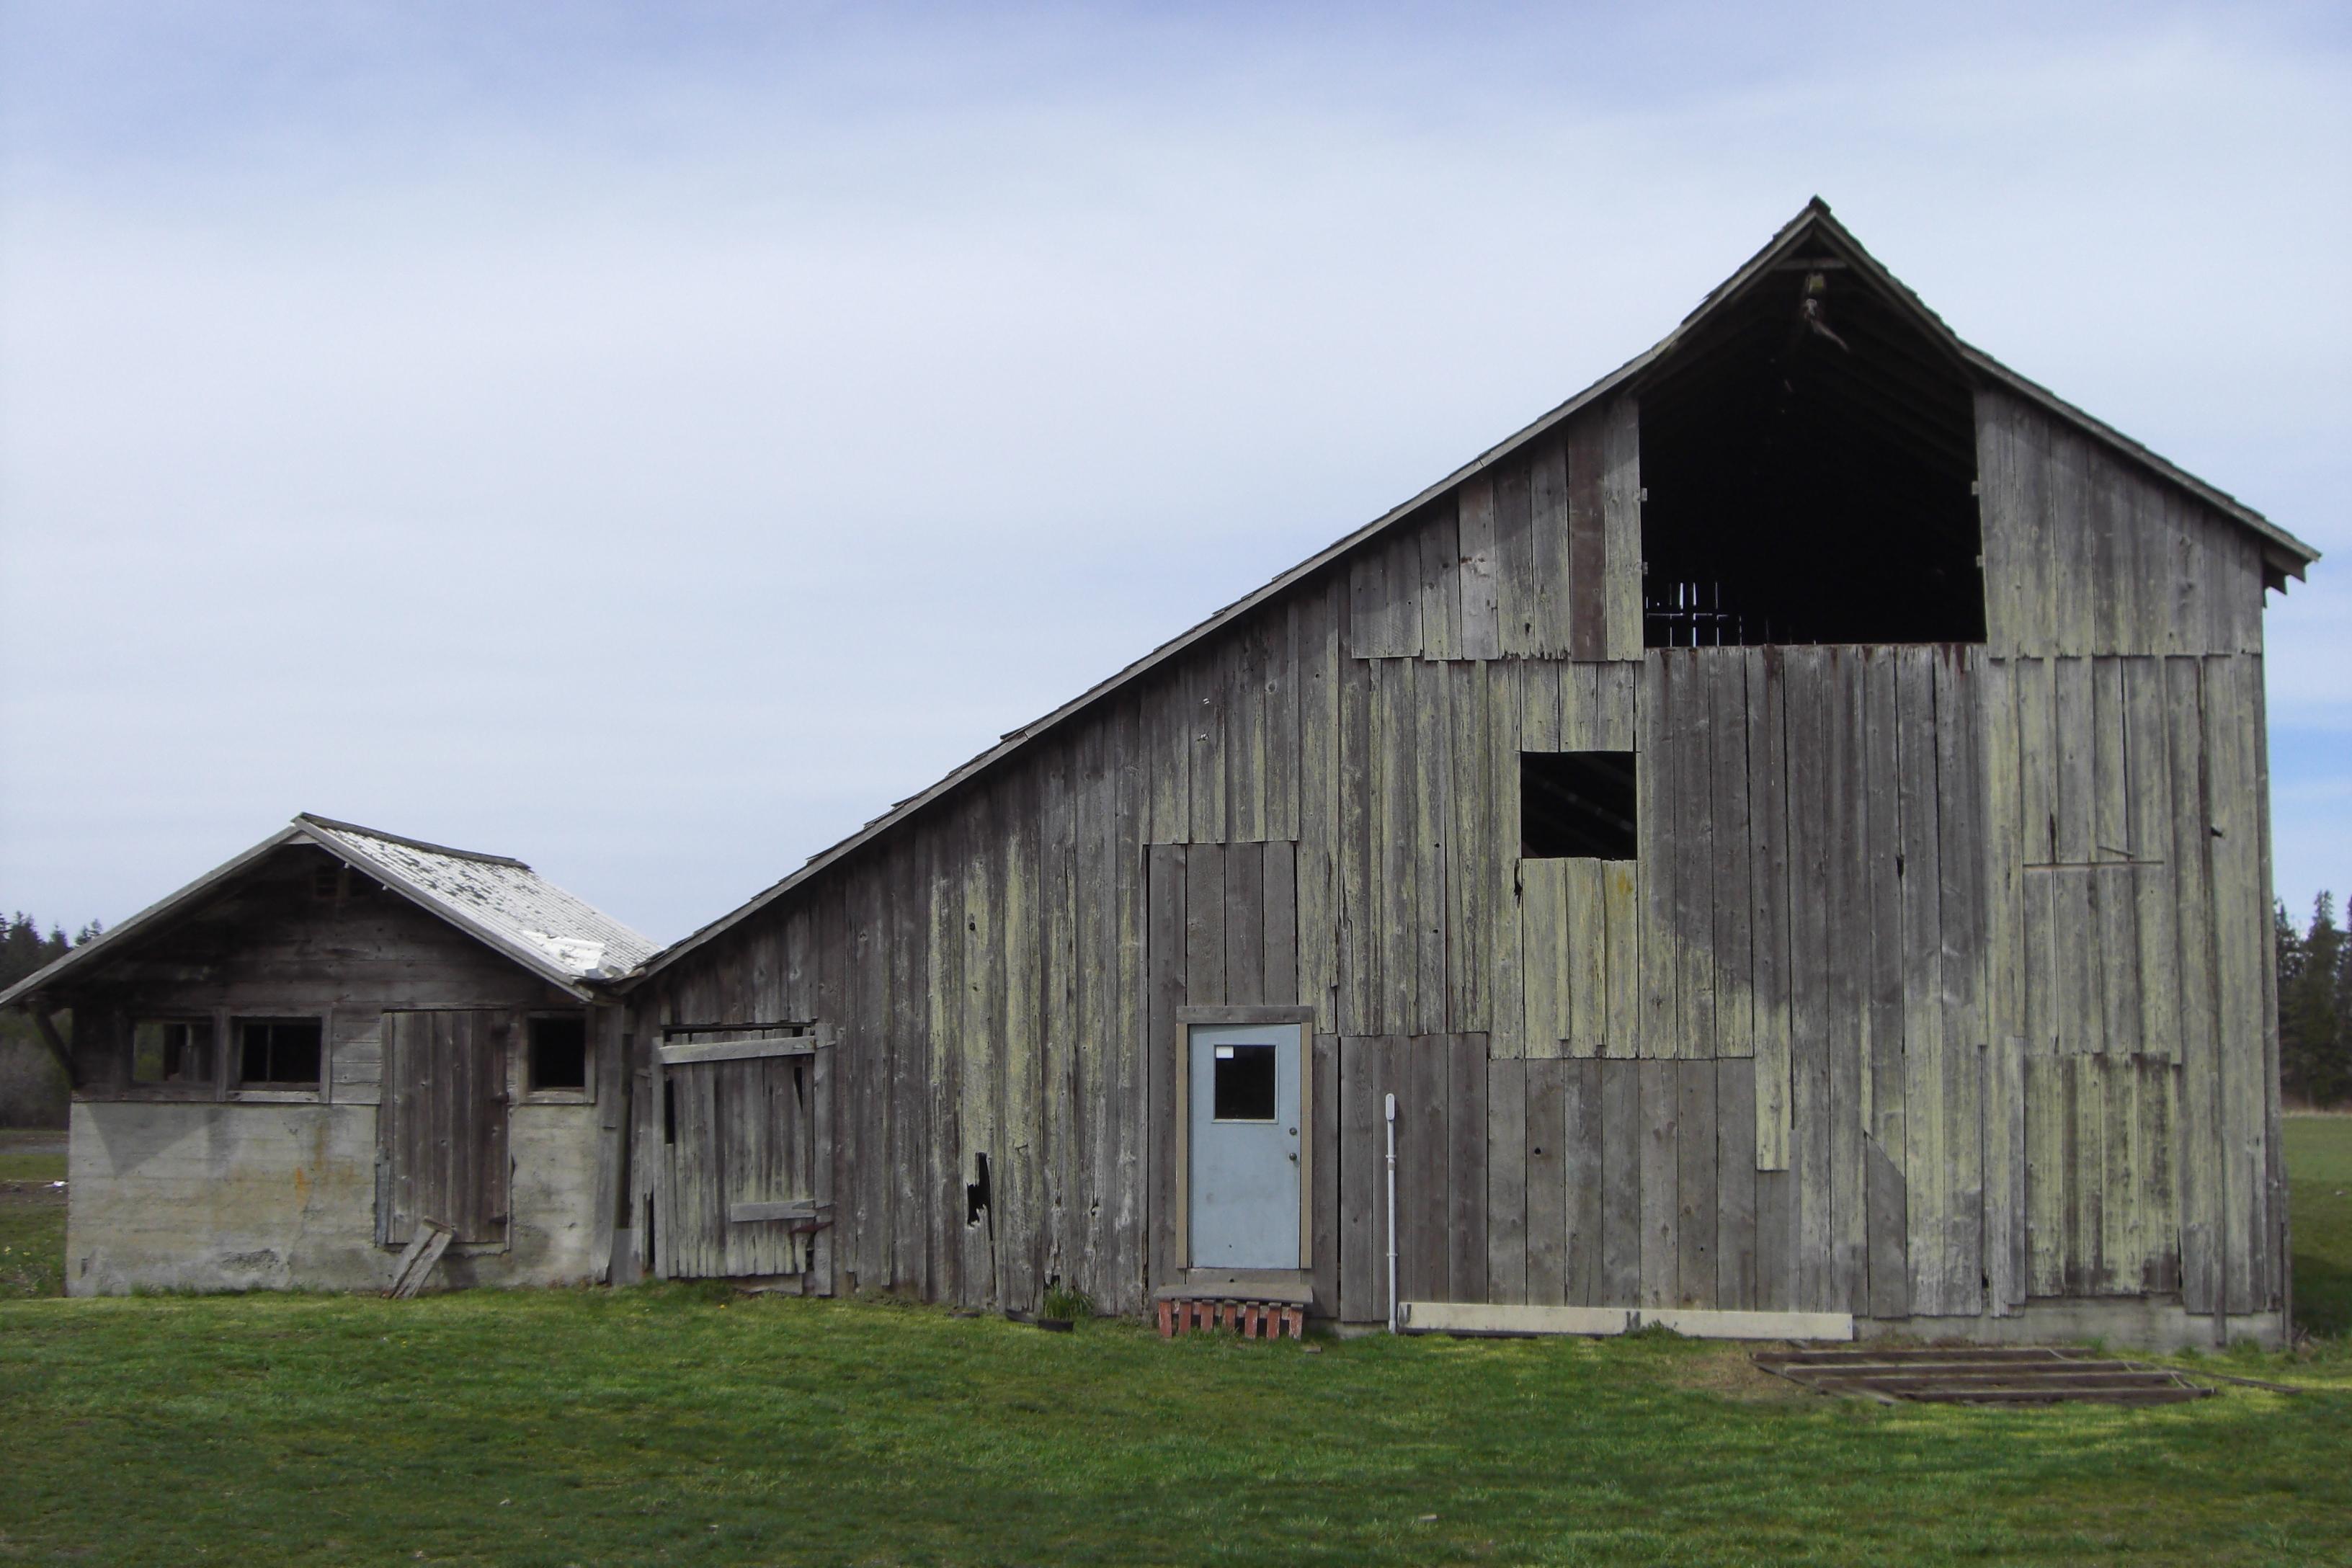 Roof Type Historic Barns Of The San Juan Islands